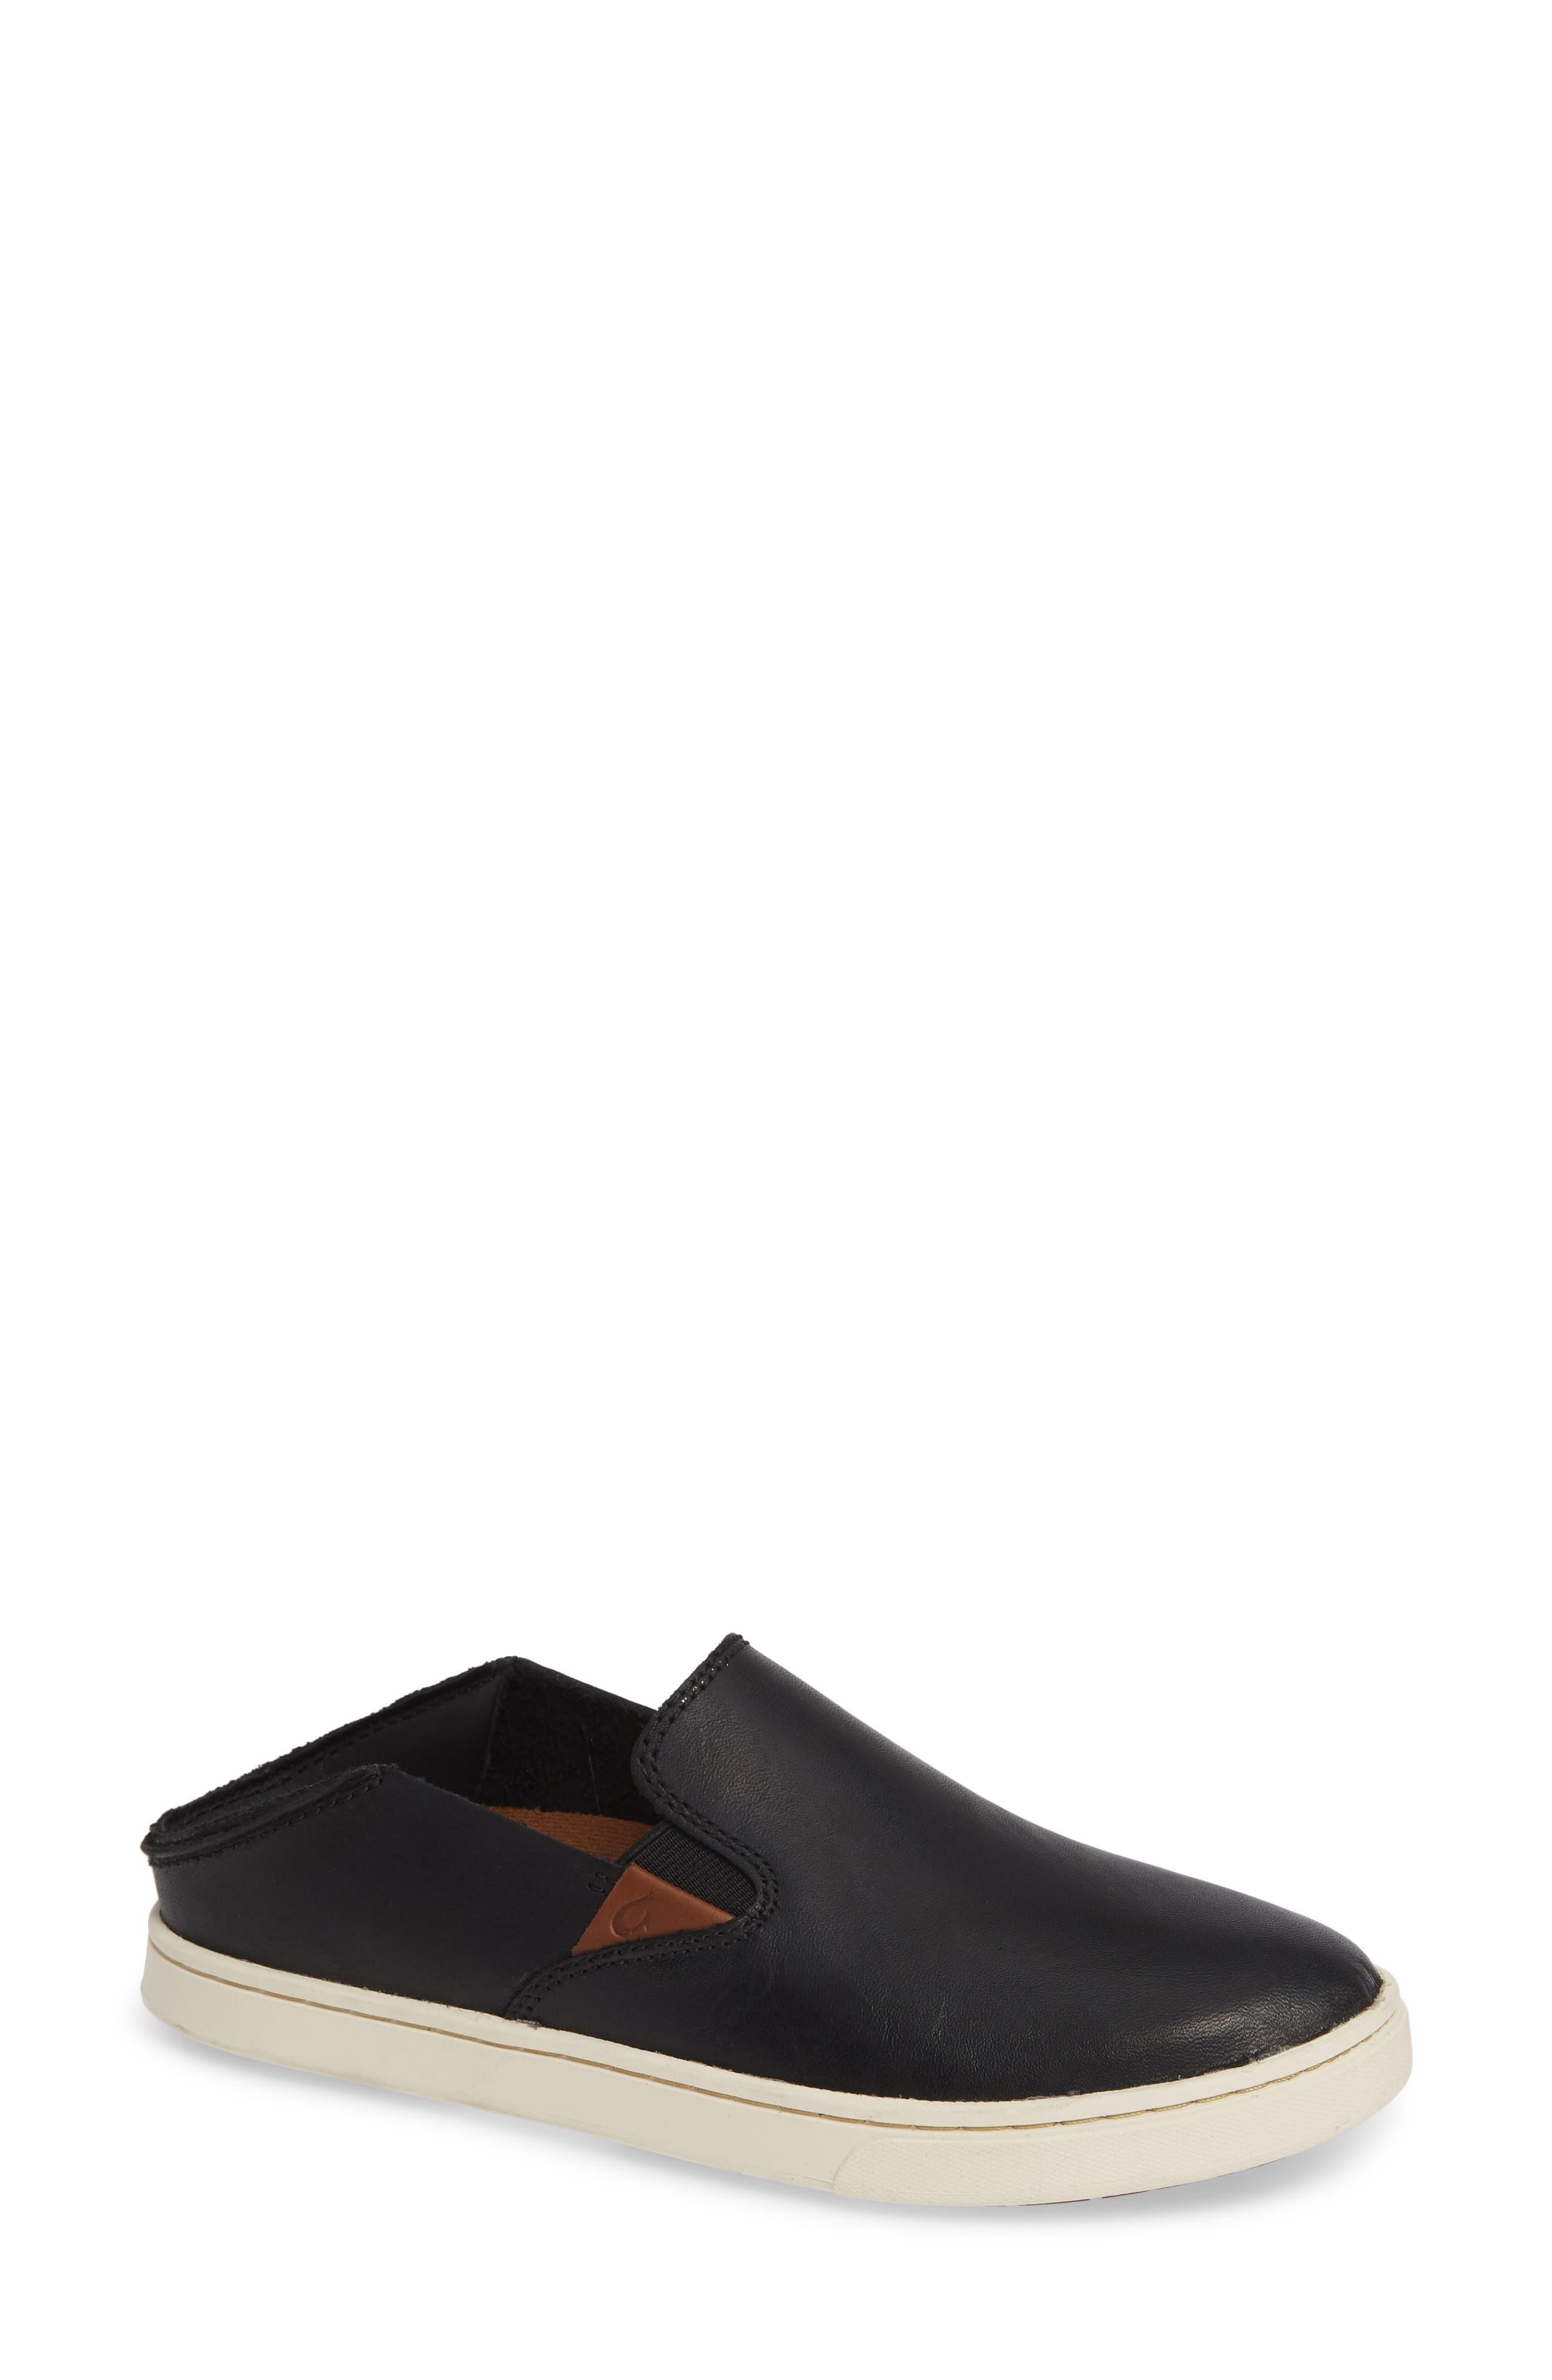 Pehuea Slip-On Sneaker,                             Main thumbnail 1, color,                             BLACK/ BLACK LEATHER